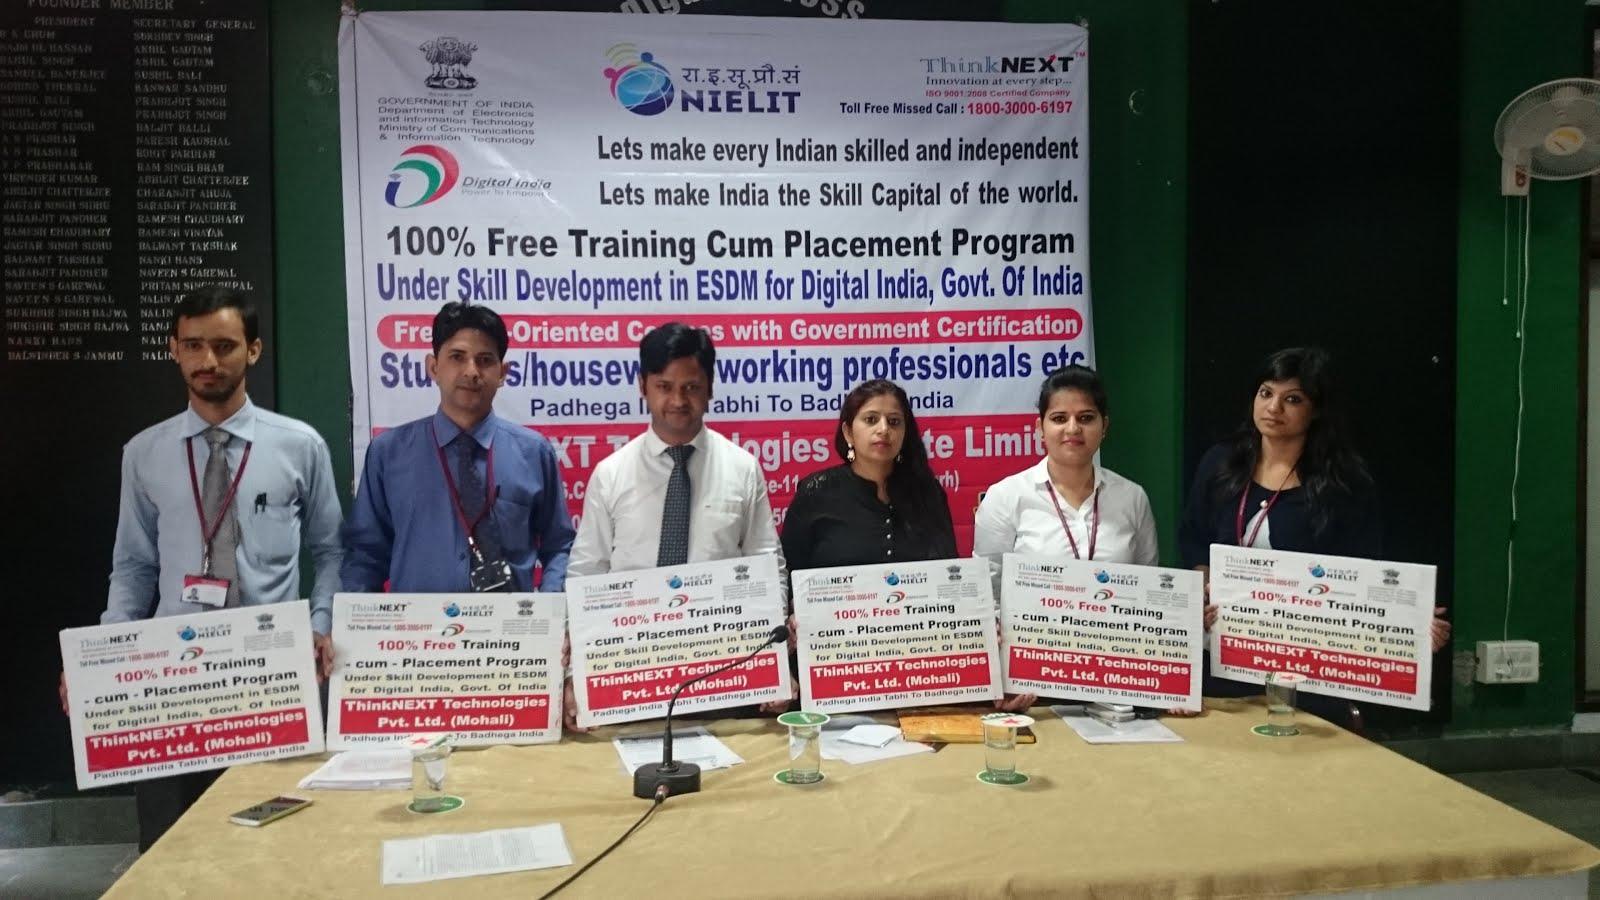 121newsonline com: ThinkNEXT Launch Free Skill Development